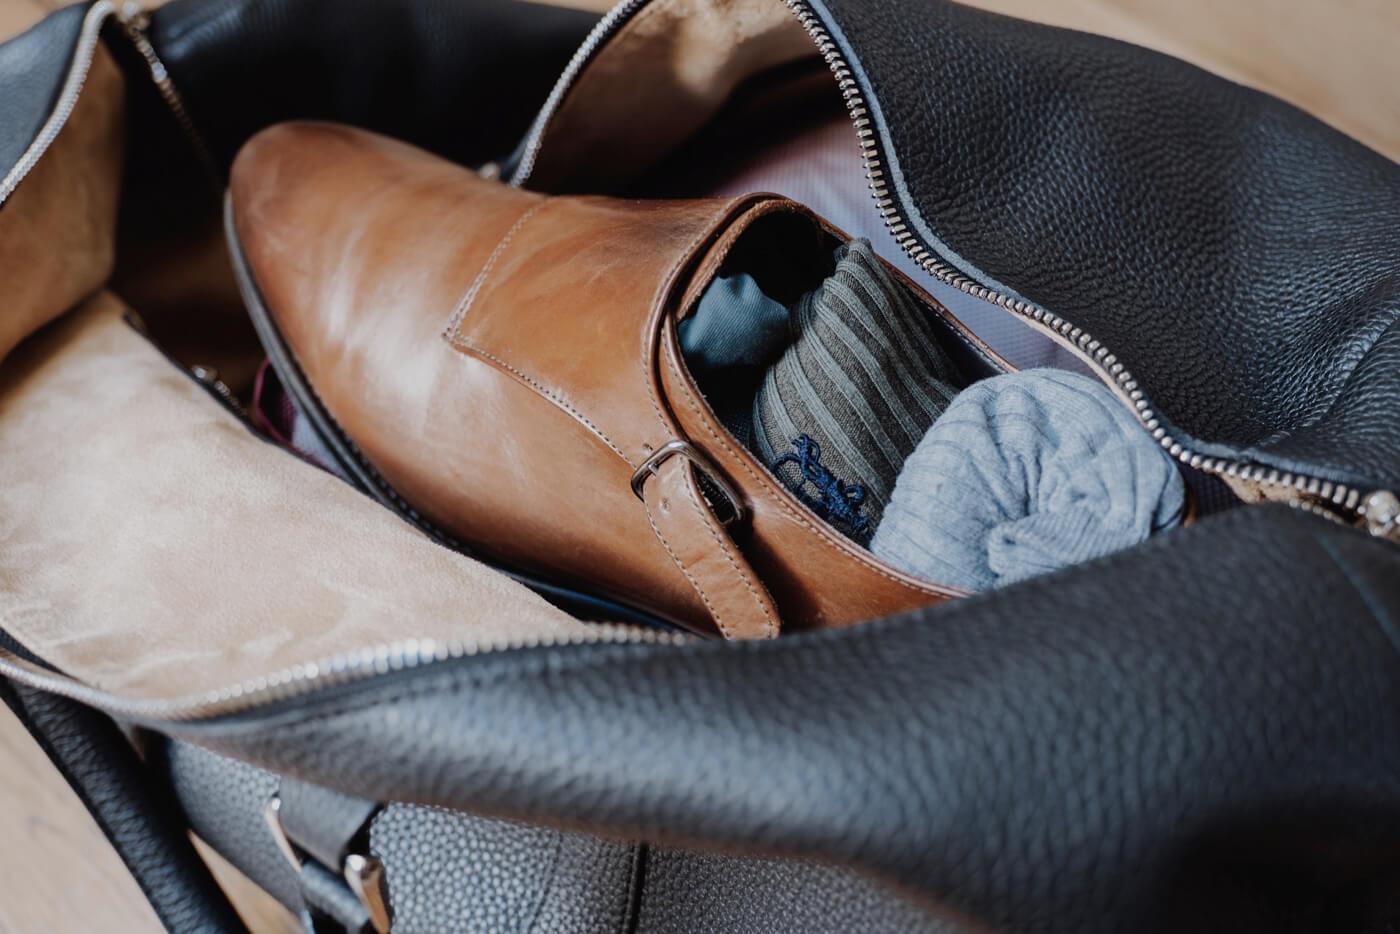 buty transport torba skórzana